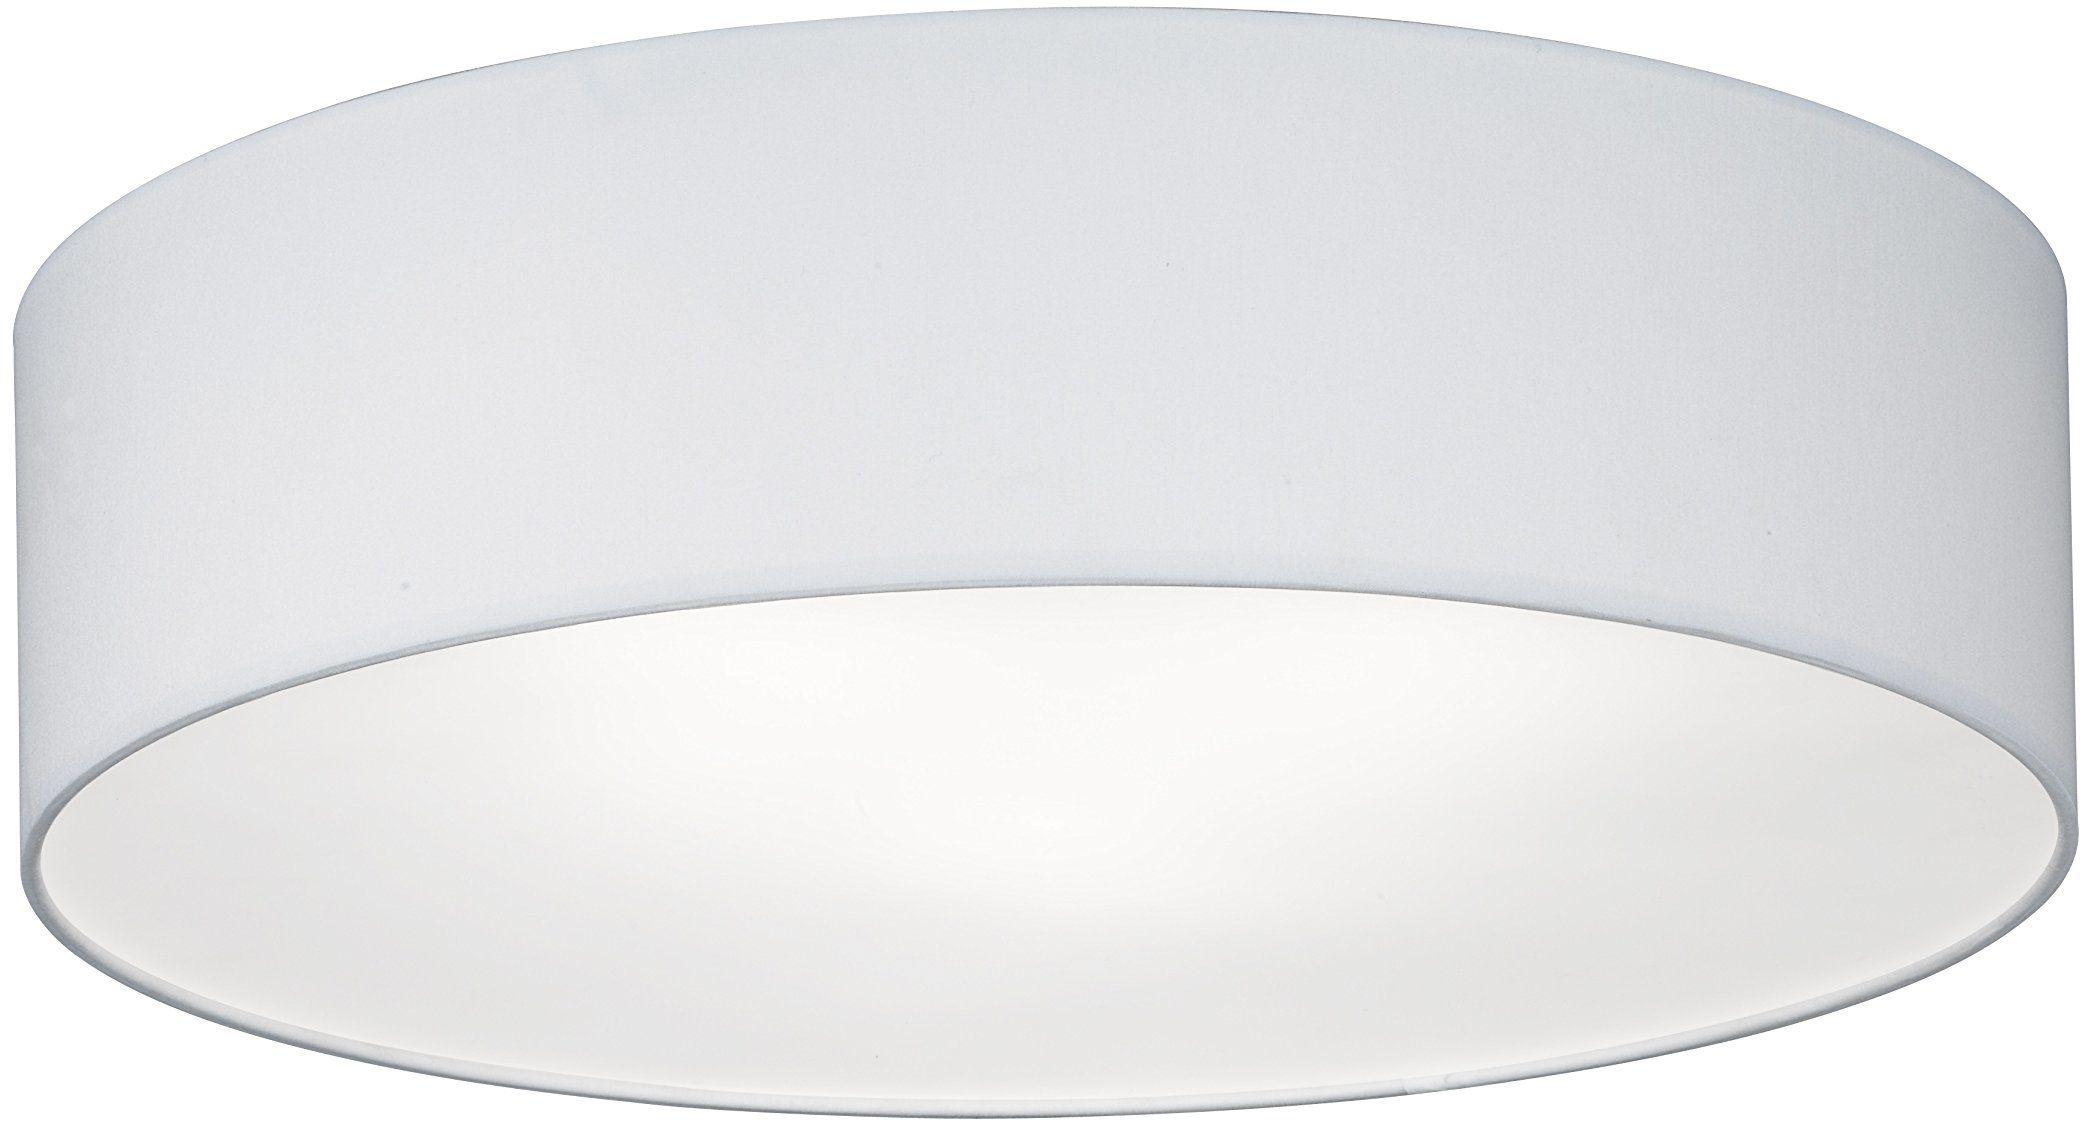 Fischer & Honsel lampa sufitowa, biała